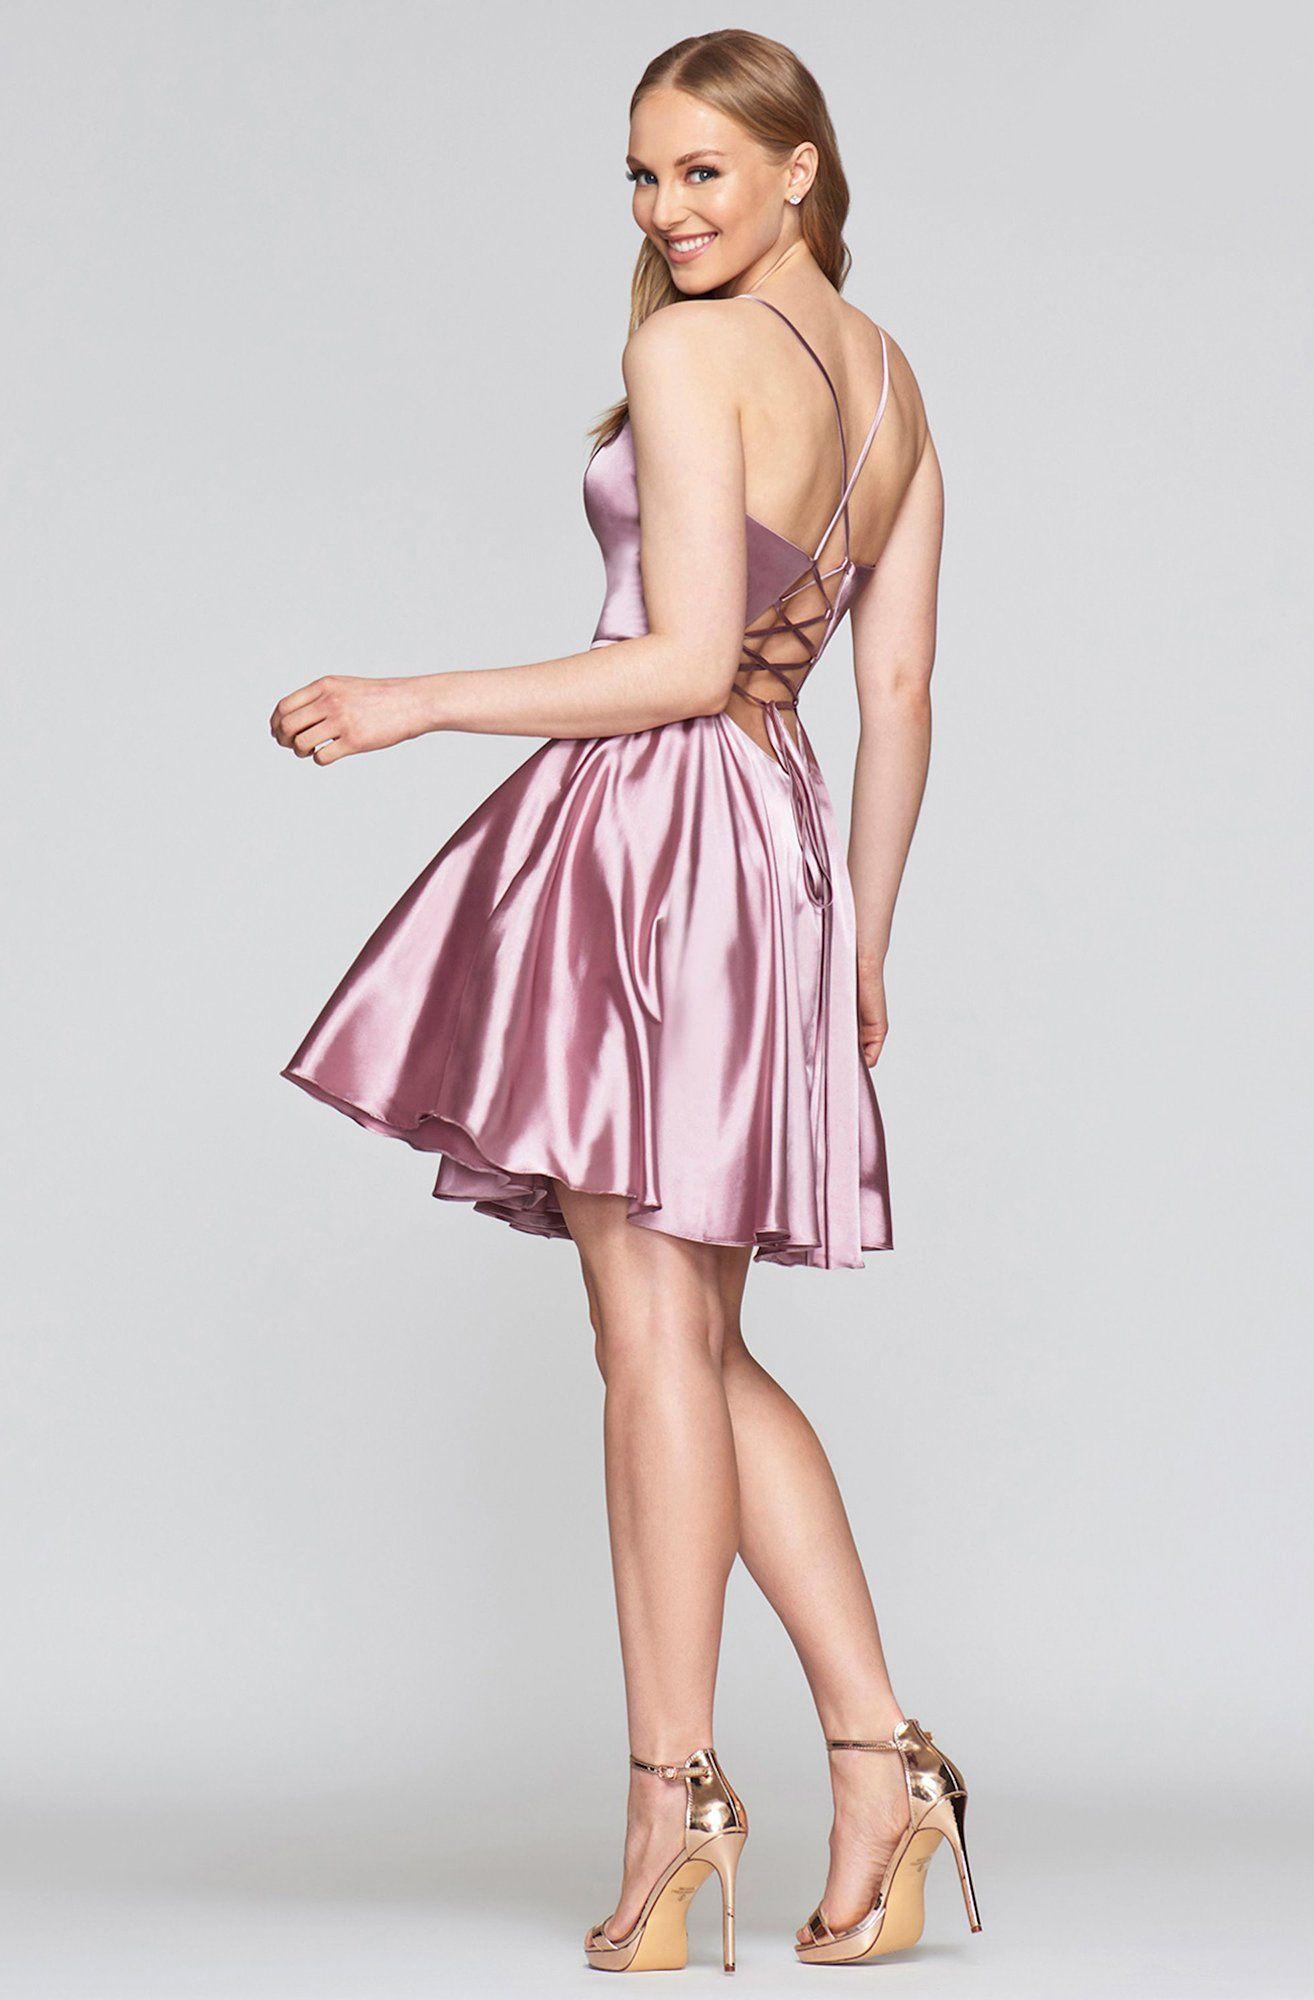 Faviana S10362 Charmeuse Satin V Neck Lace Up Back Cocktail Dress Cocktail Dress Von Maur Dresses Pure Couture [ 2000 x 1314 Pixel ]